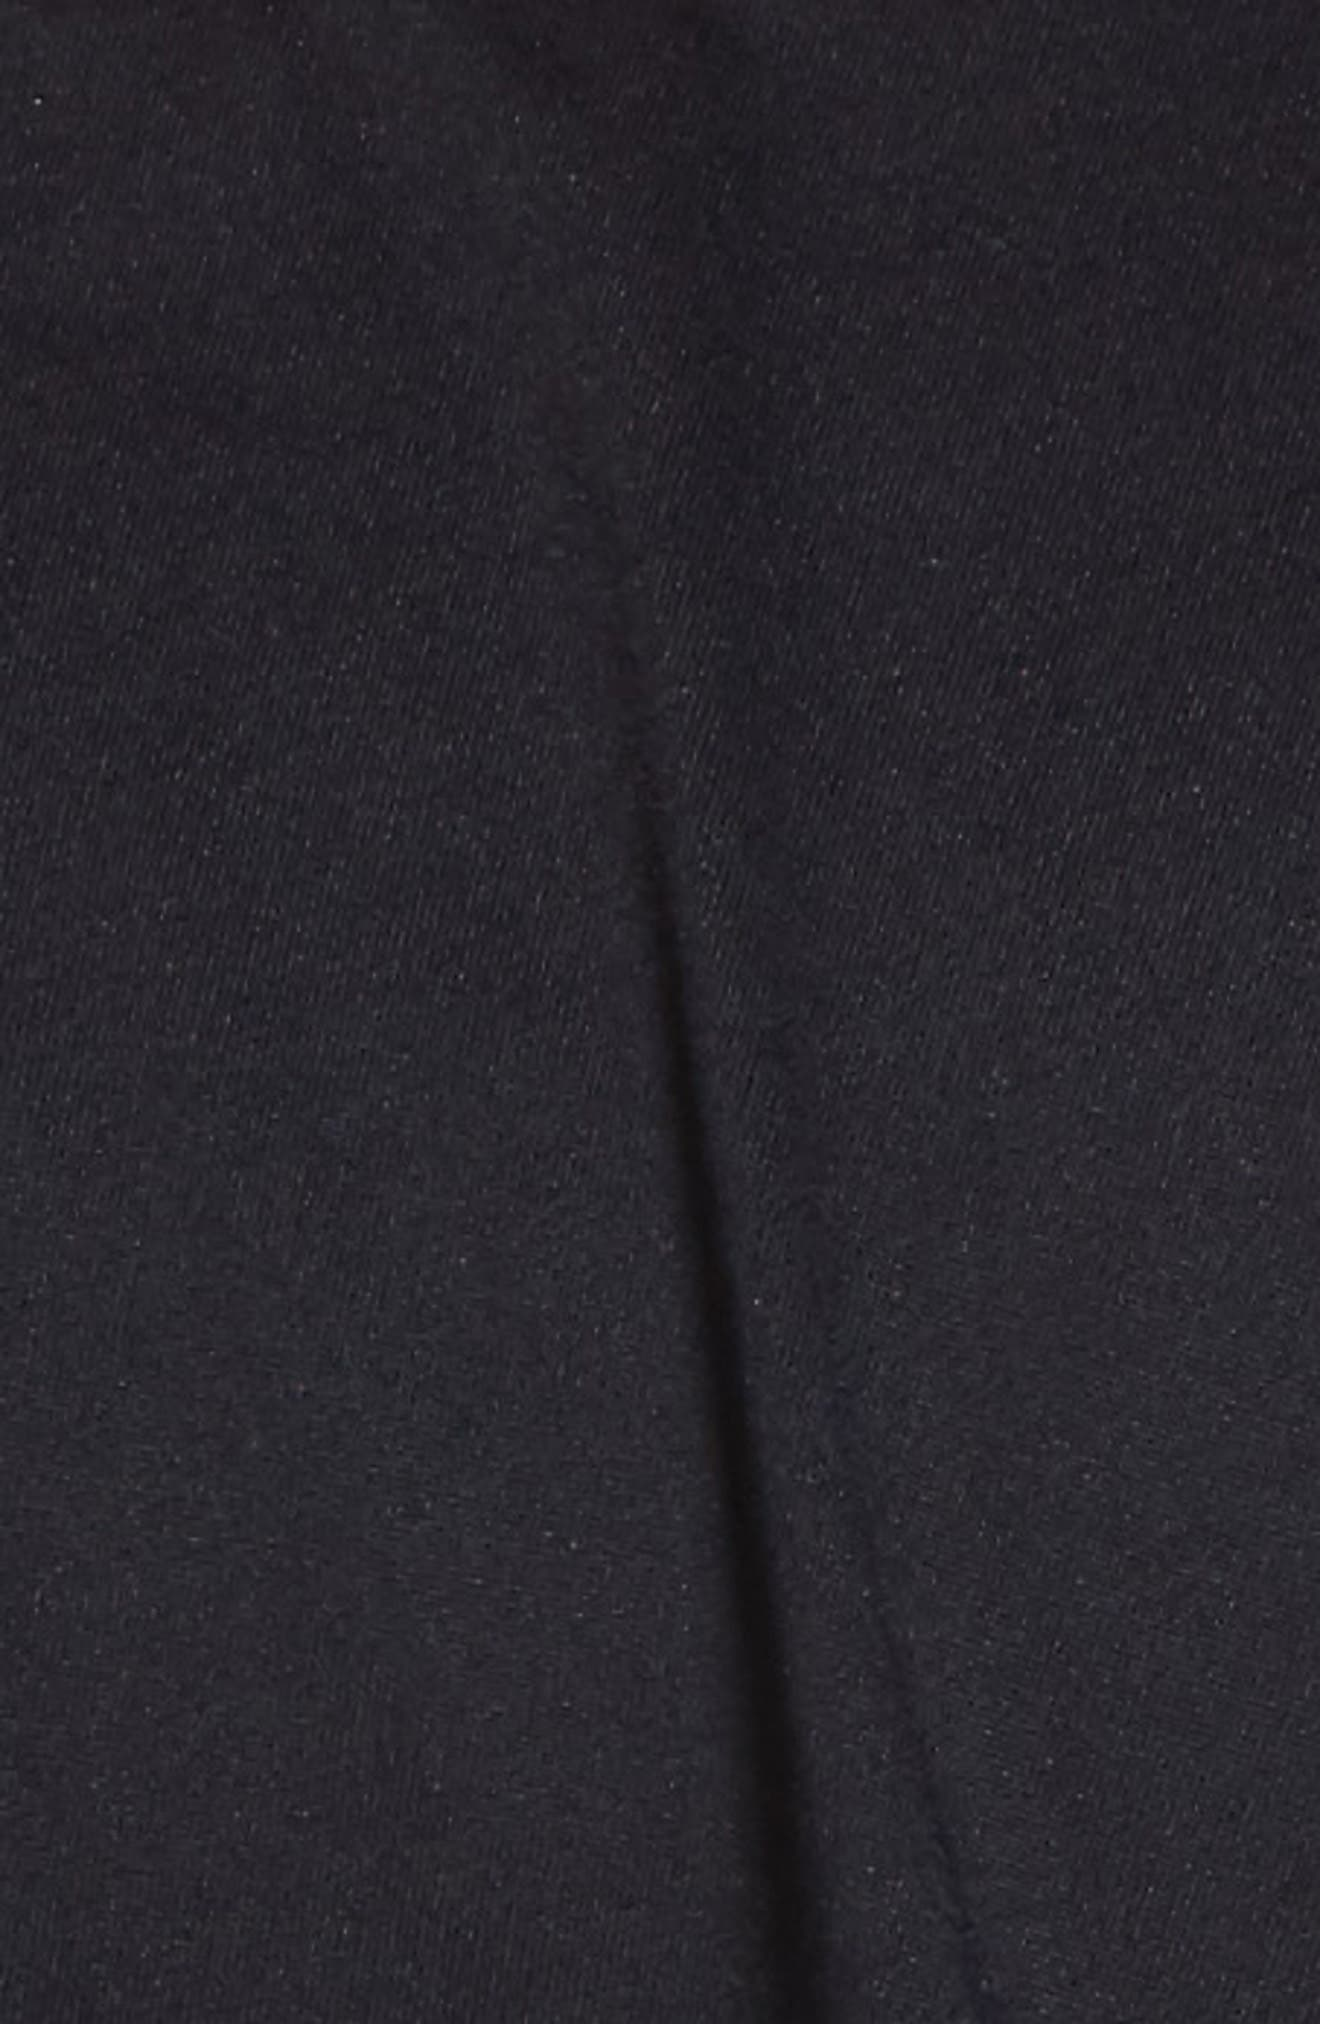 124f648c2c Shop La Blanca Off The Shoulder One-Piece Swimsuit In Black